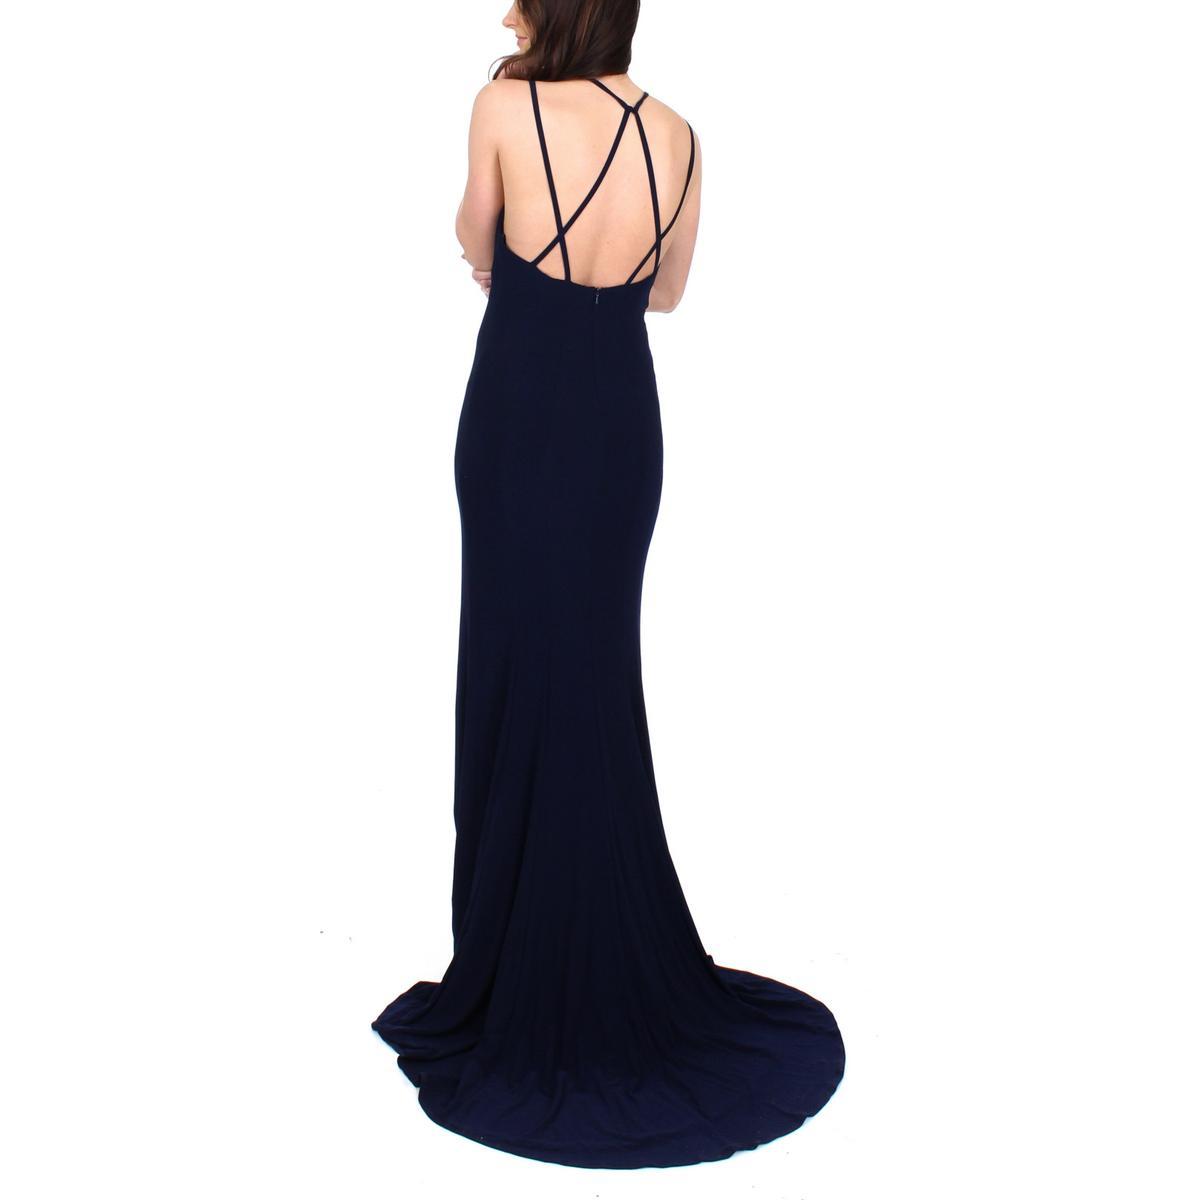 Faviana Womens Prom Full-Length Formal Evening Dress Dress Dress Gown BHFO 3395 c9a603